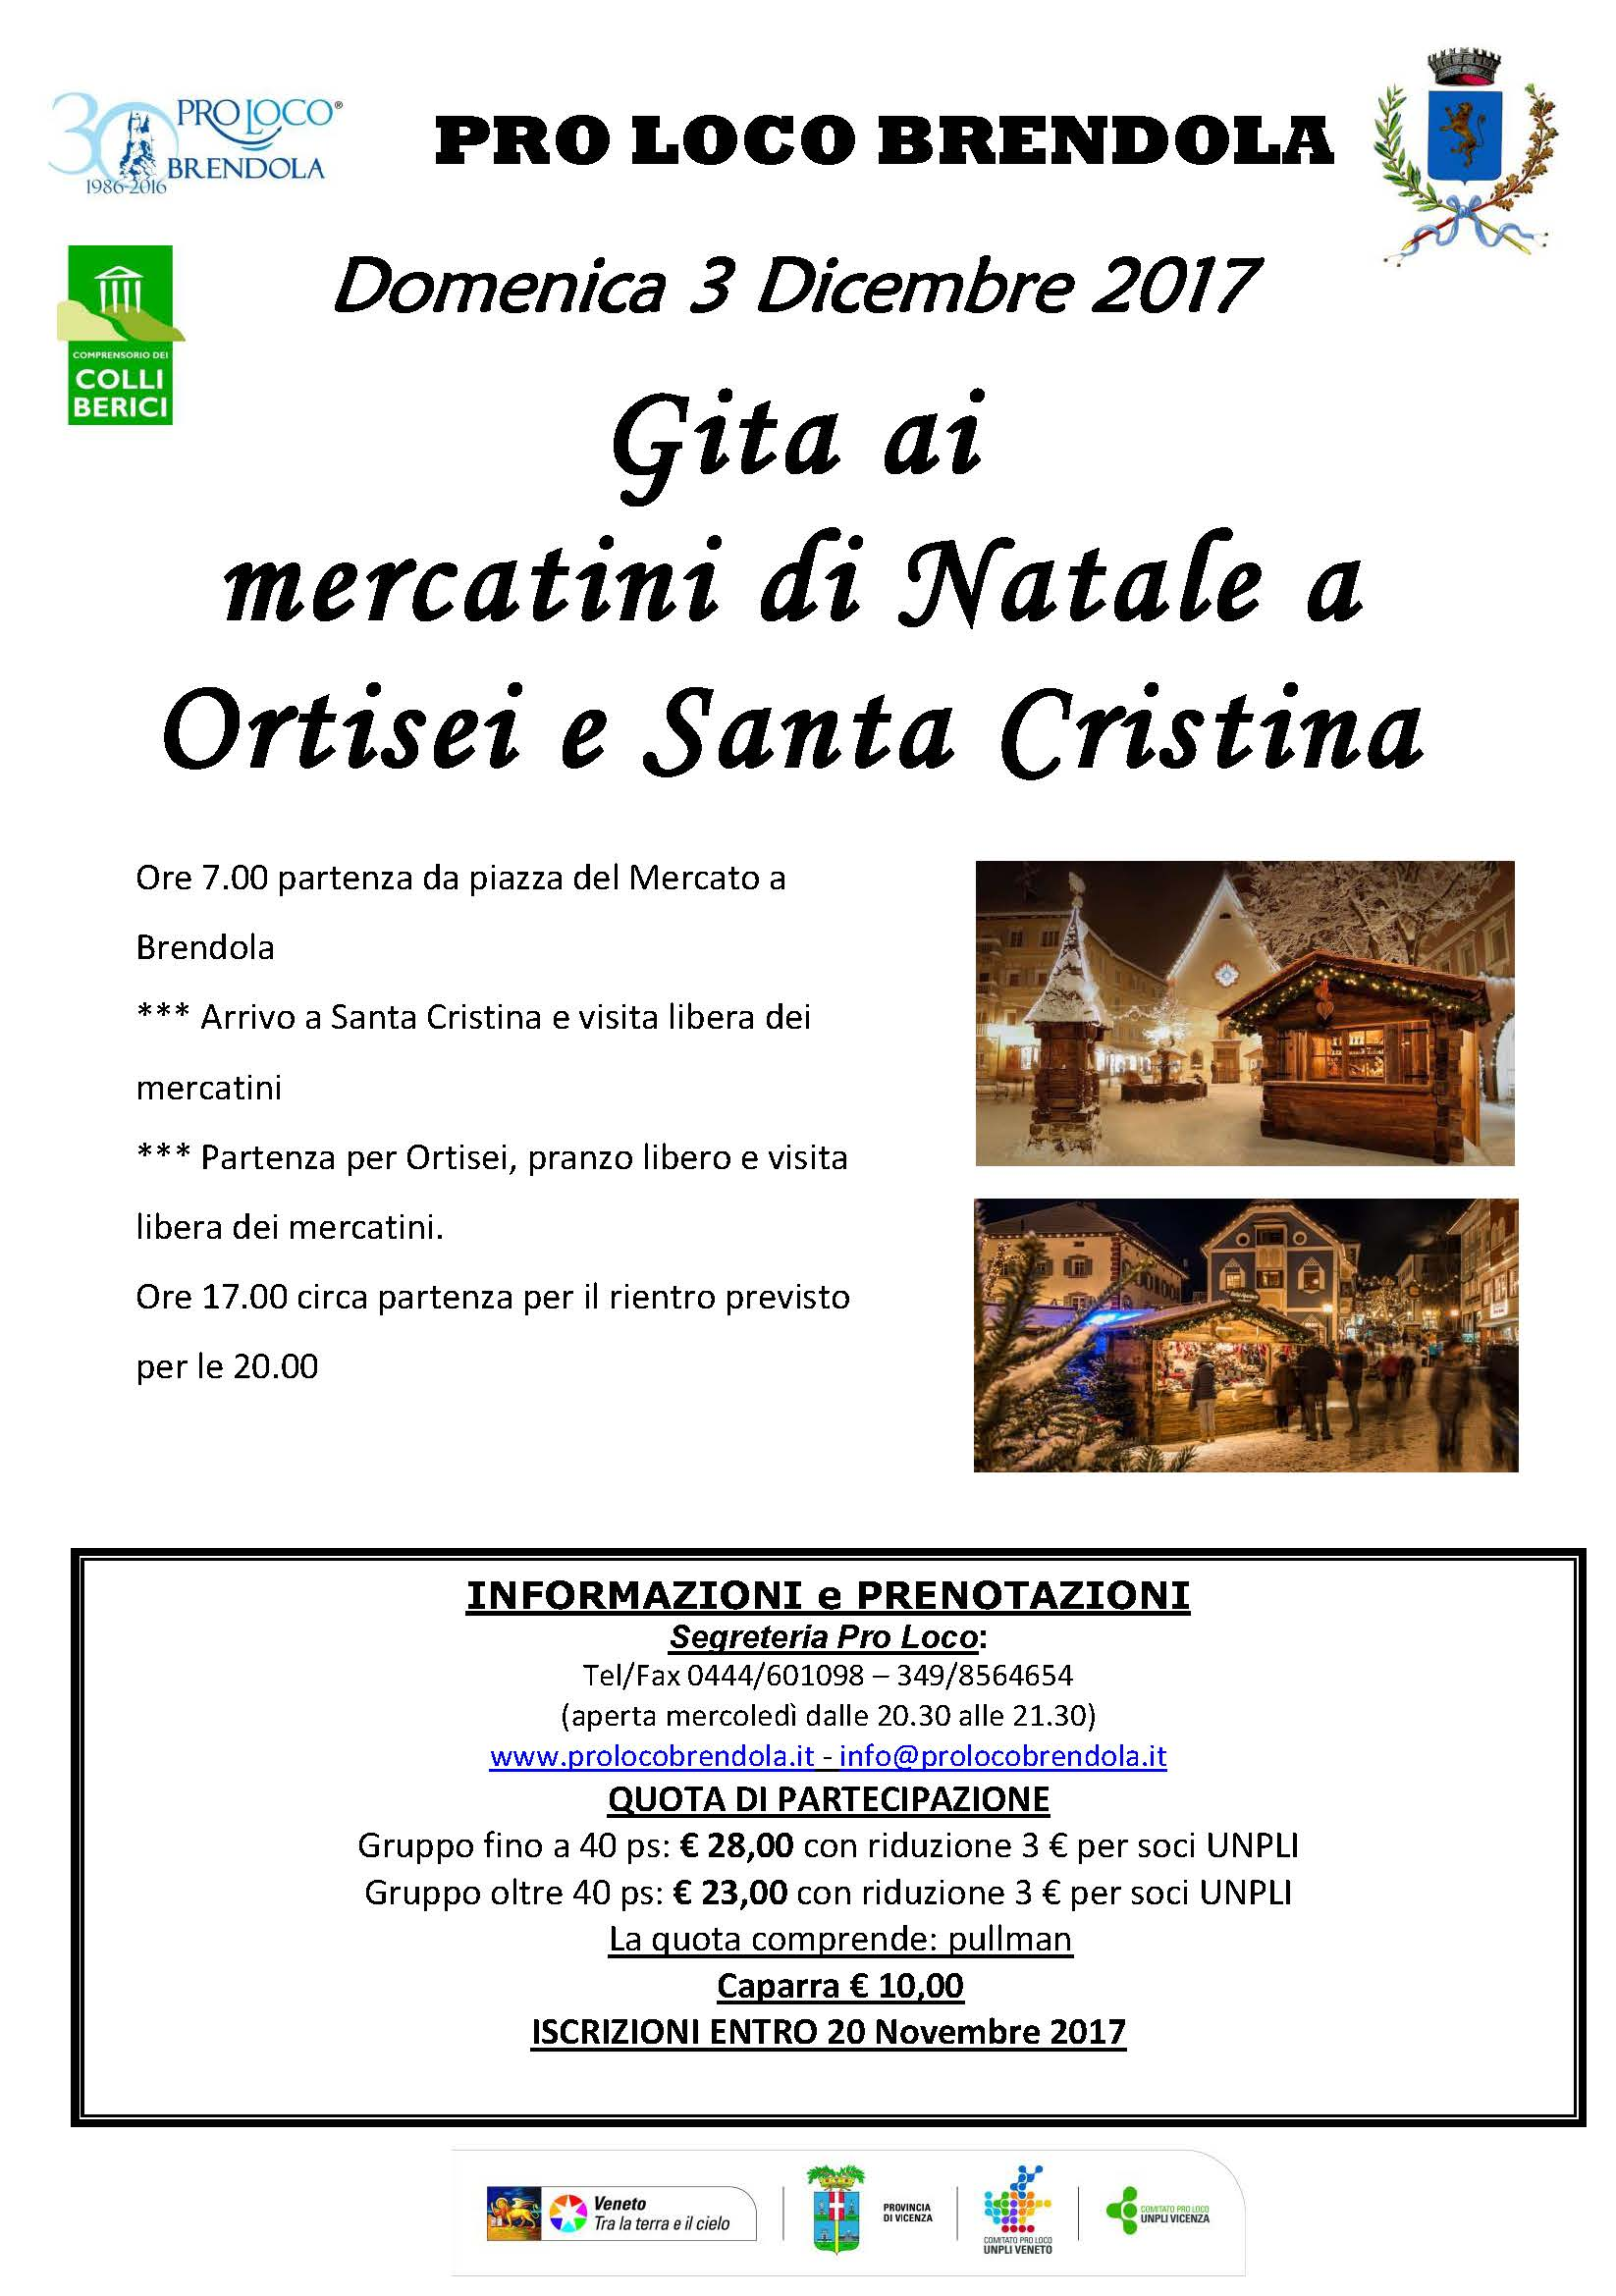 Gita Mercatini di Natale Ortisei e Santa Cristina , 03-12-17